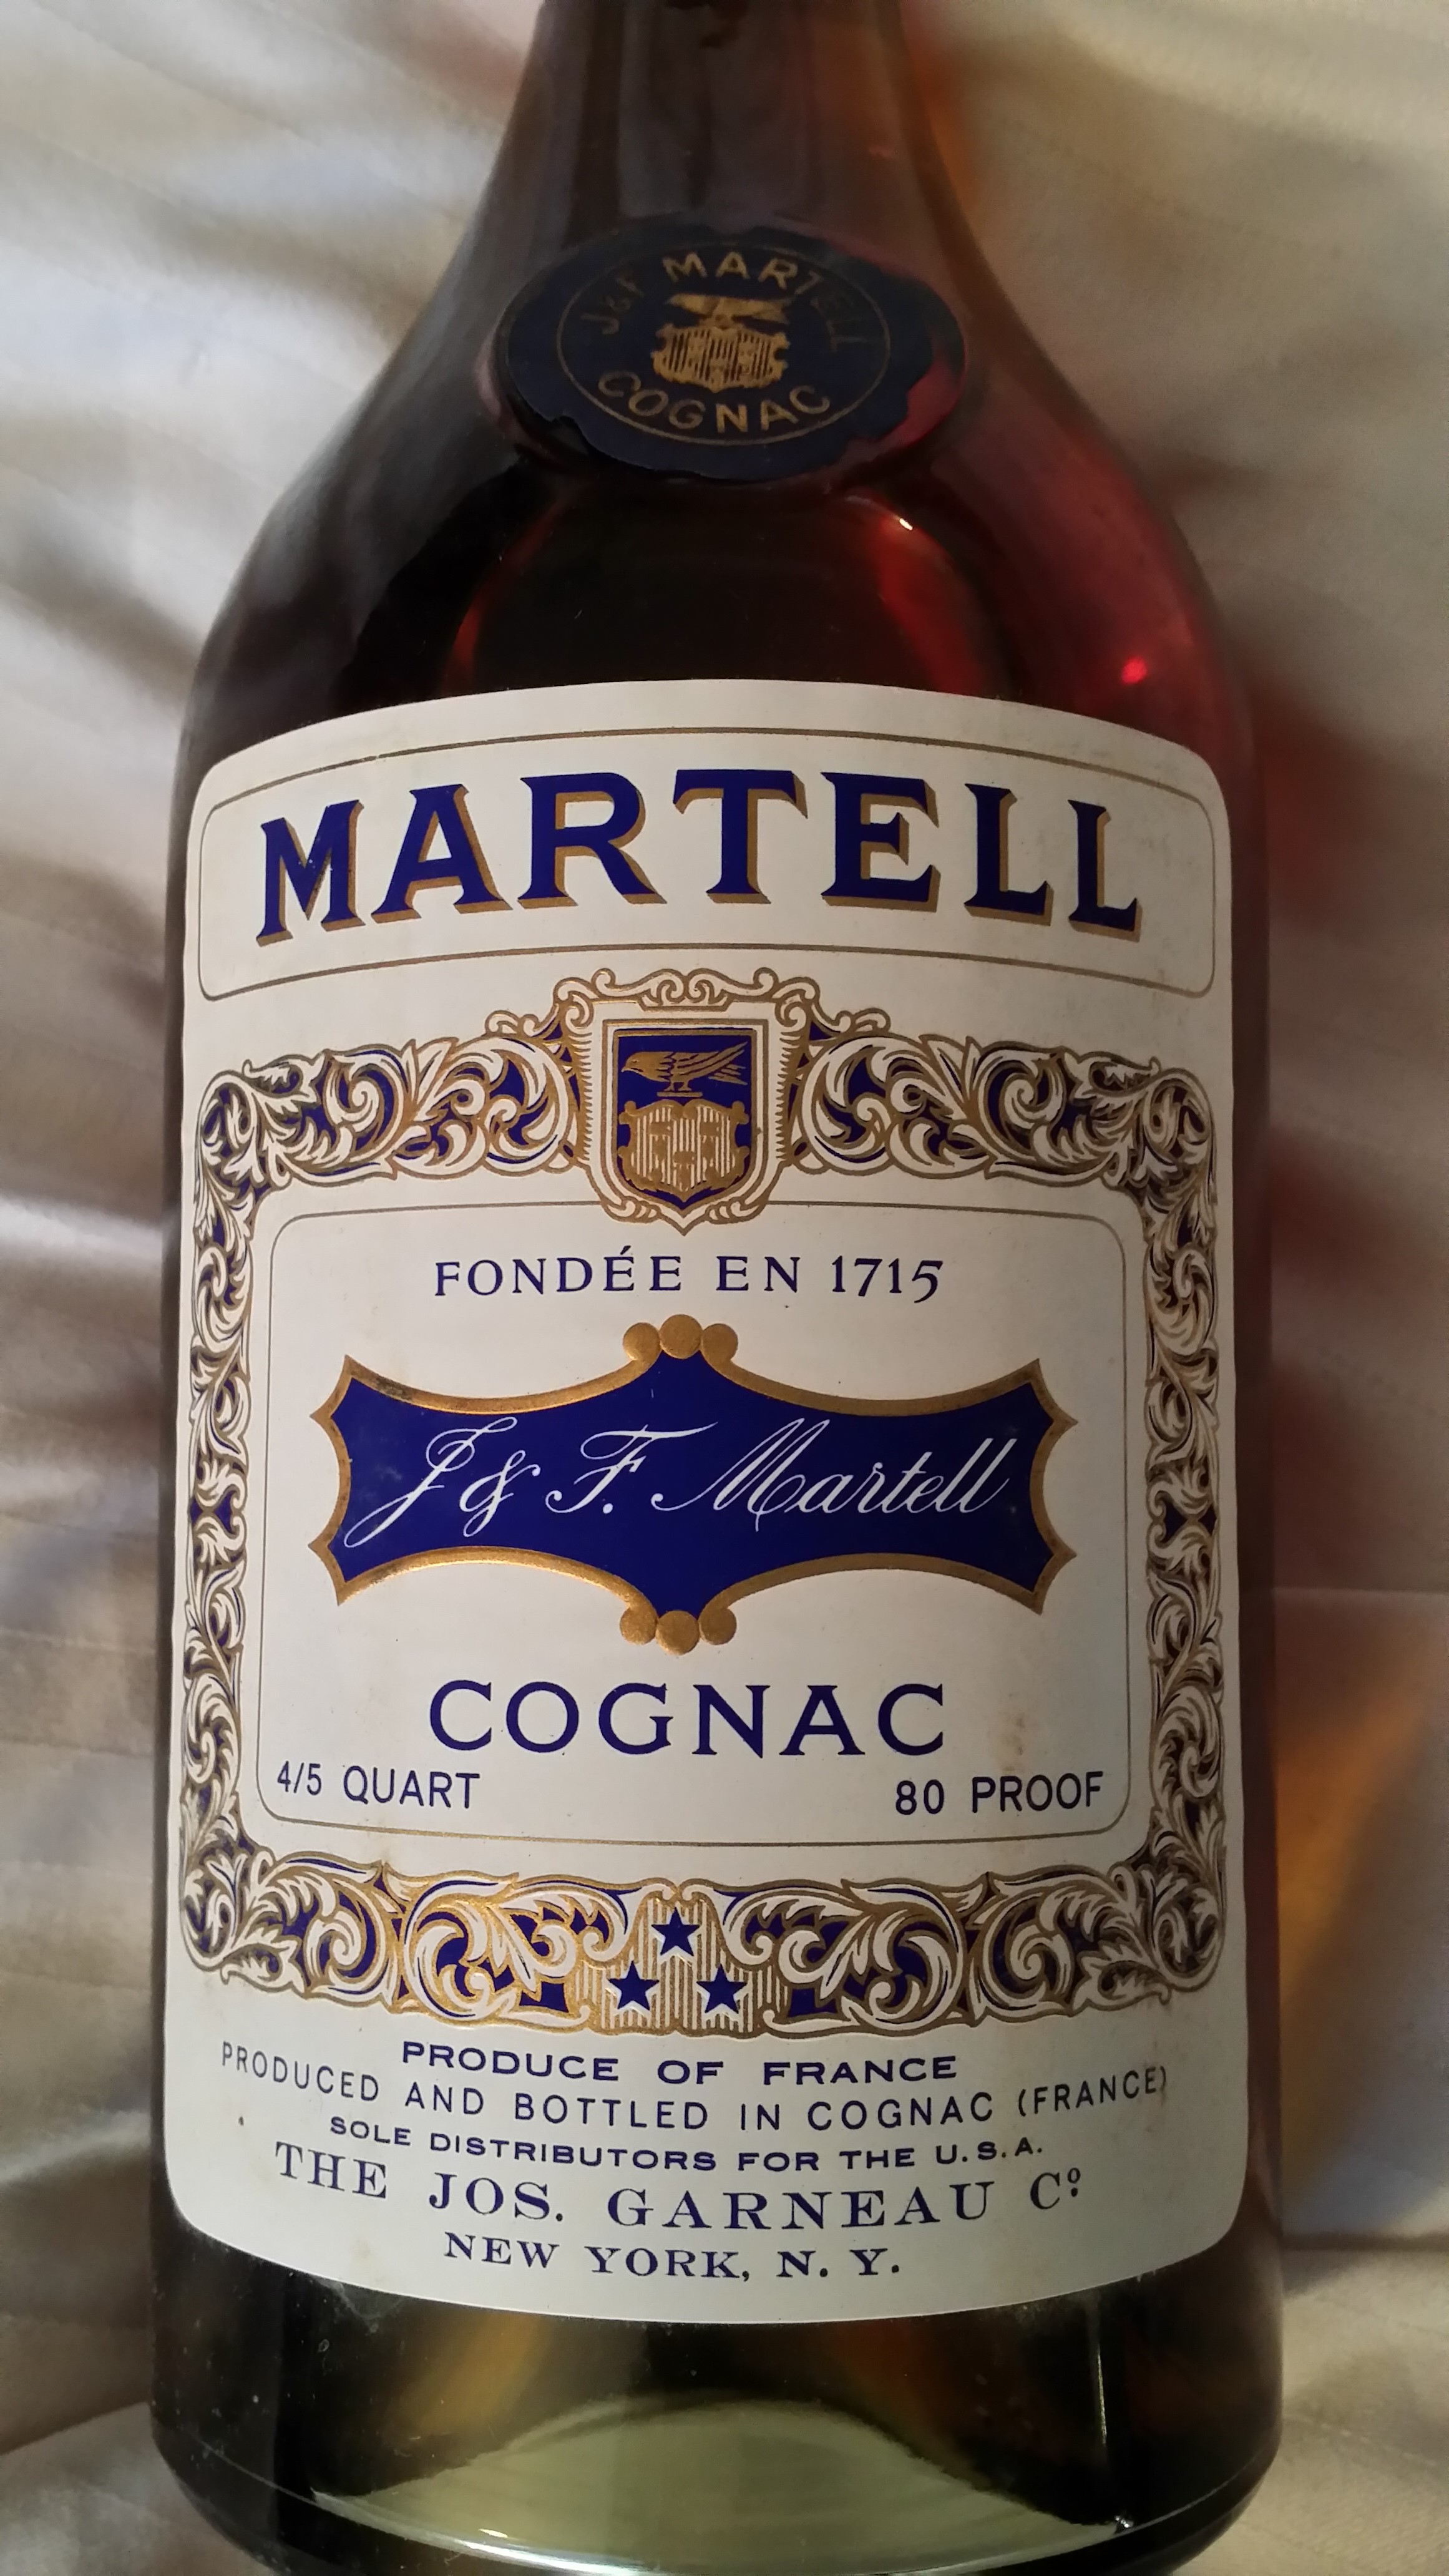 Martell Cognac Bottle